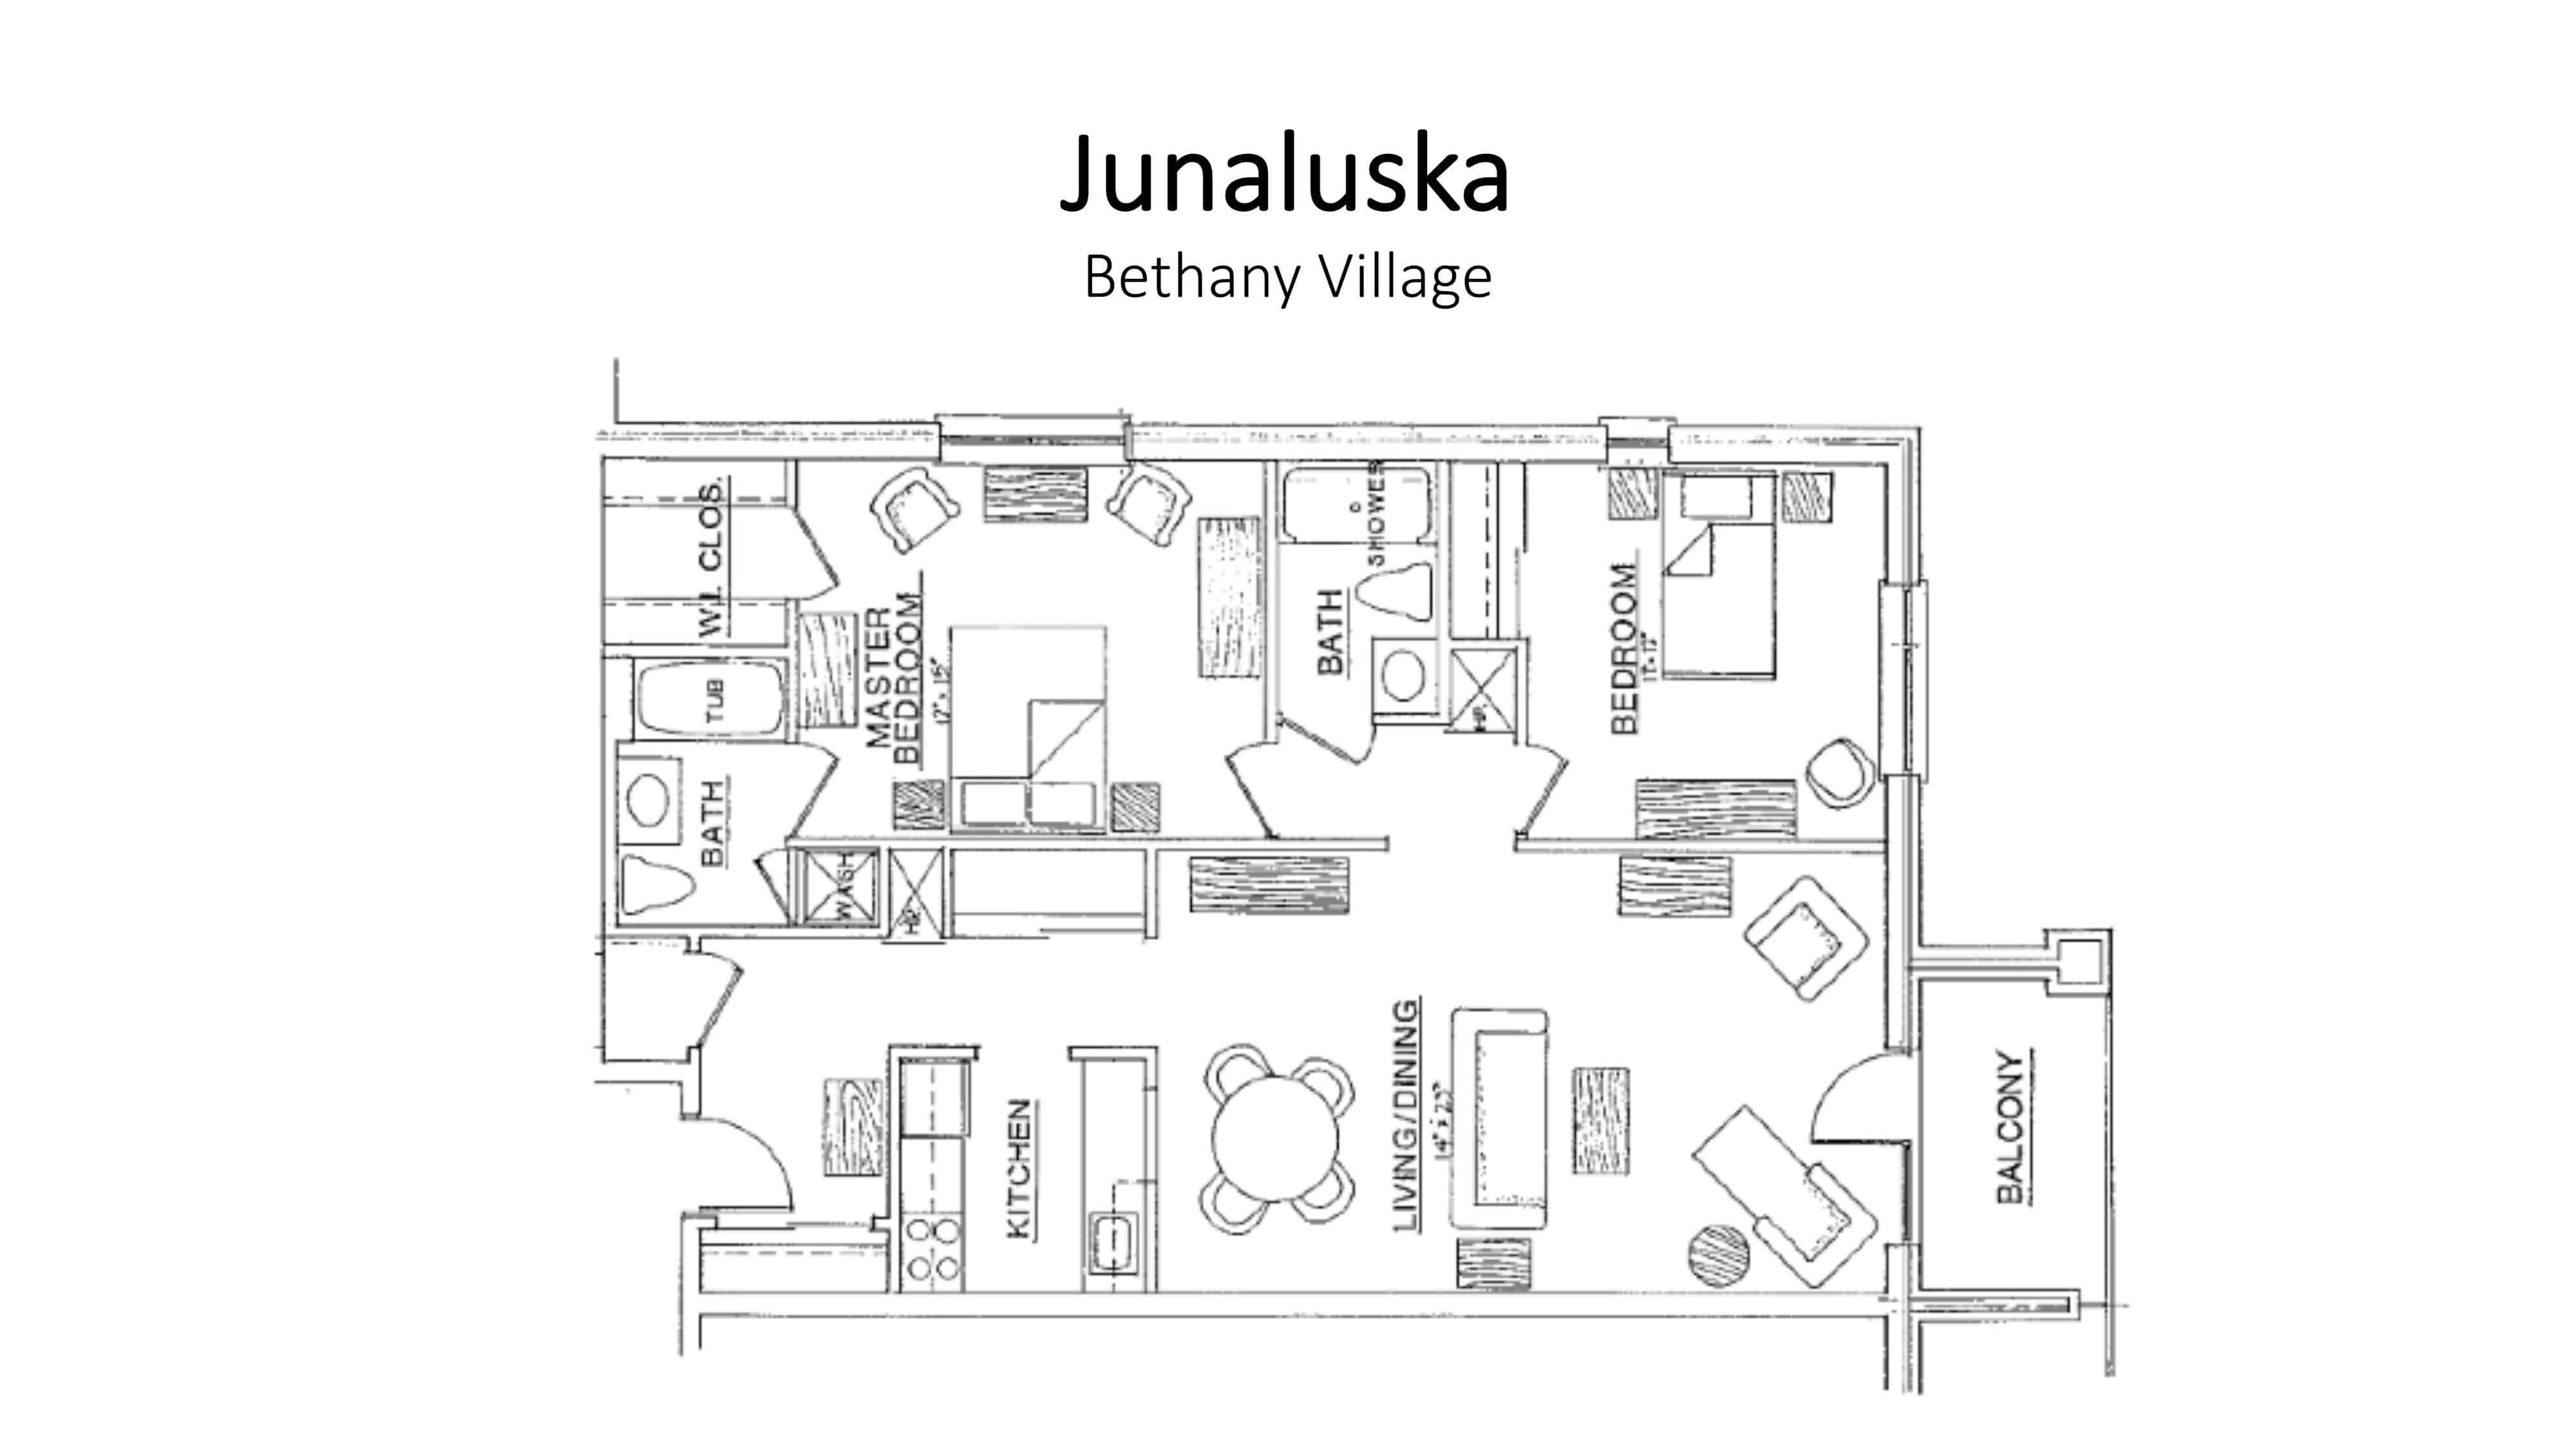 BV_Junaluska